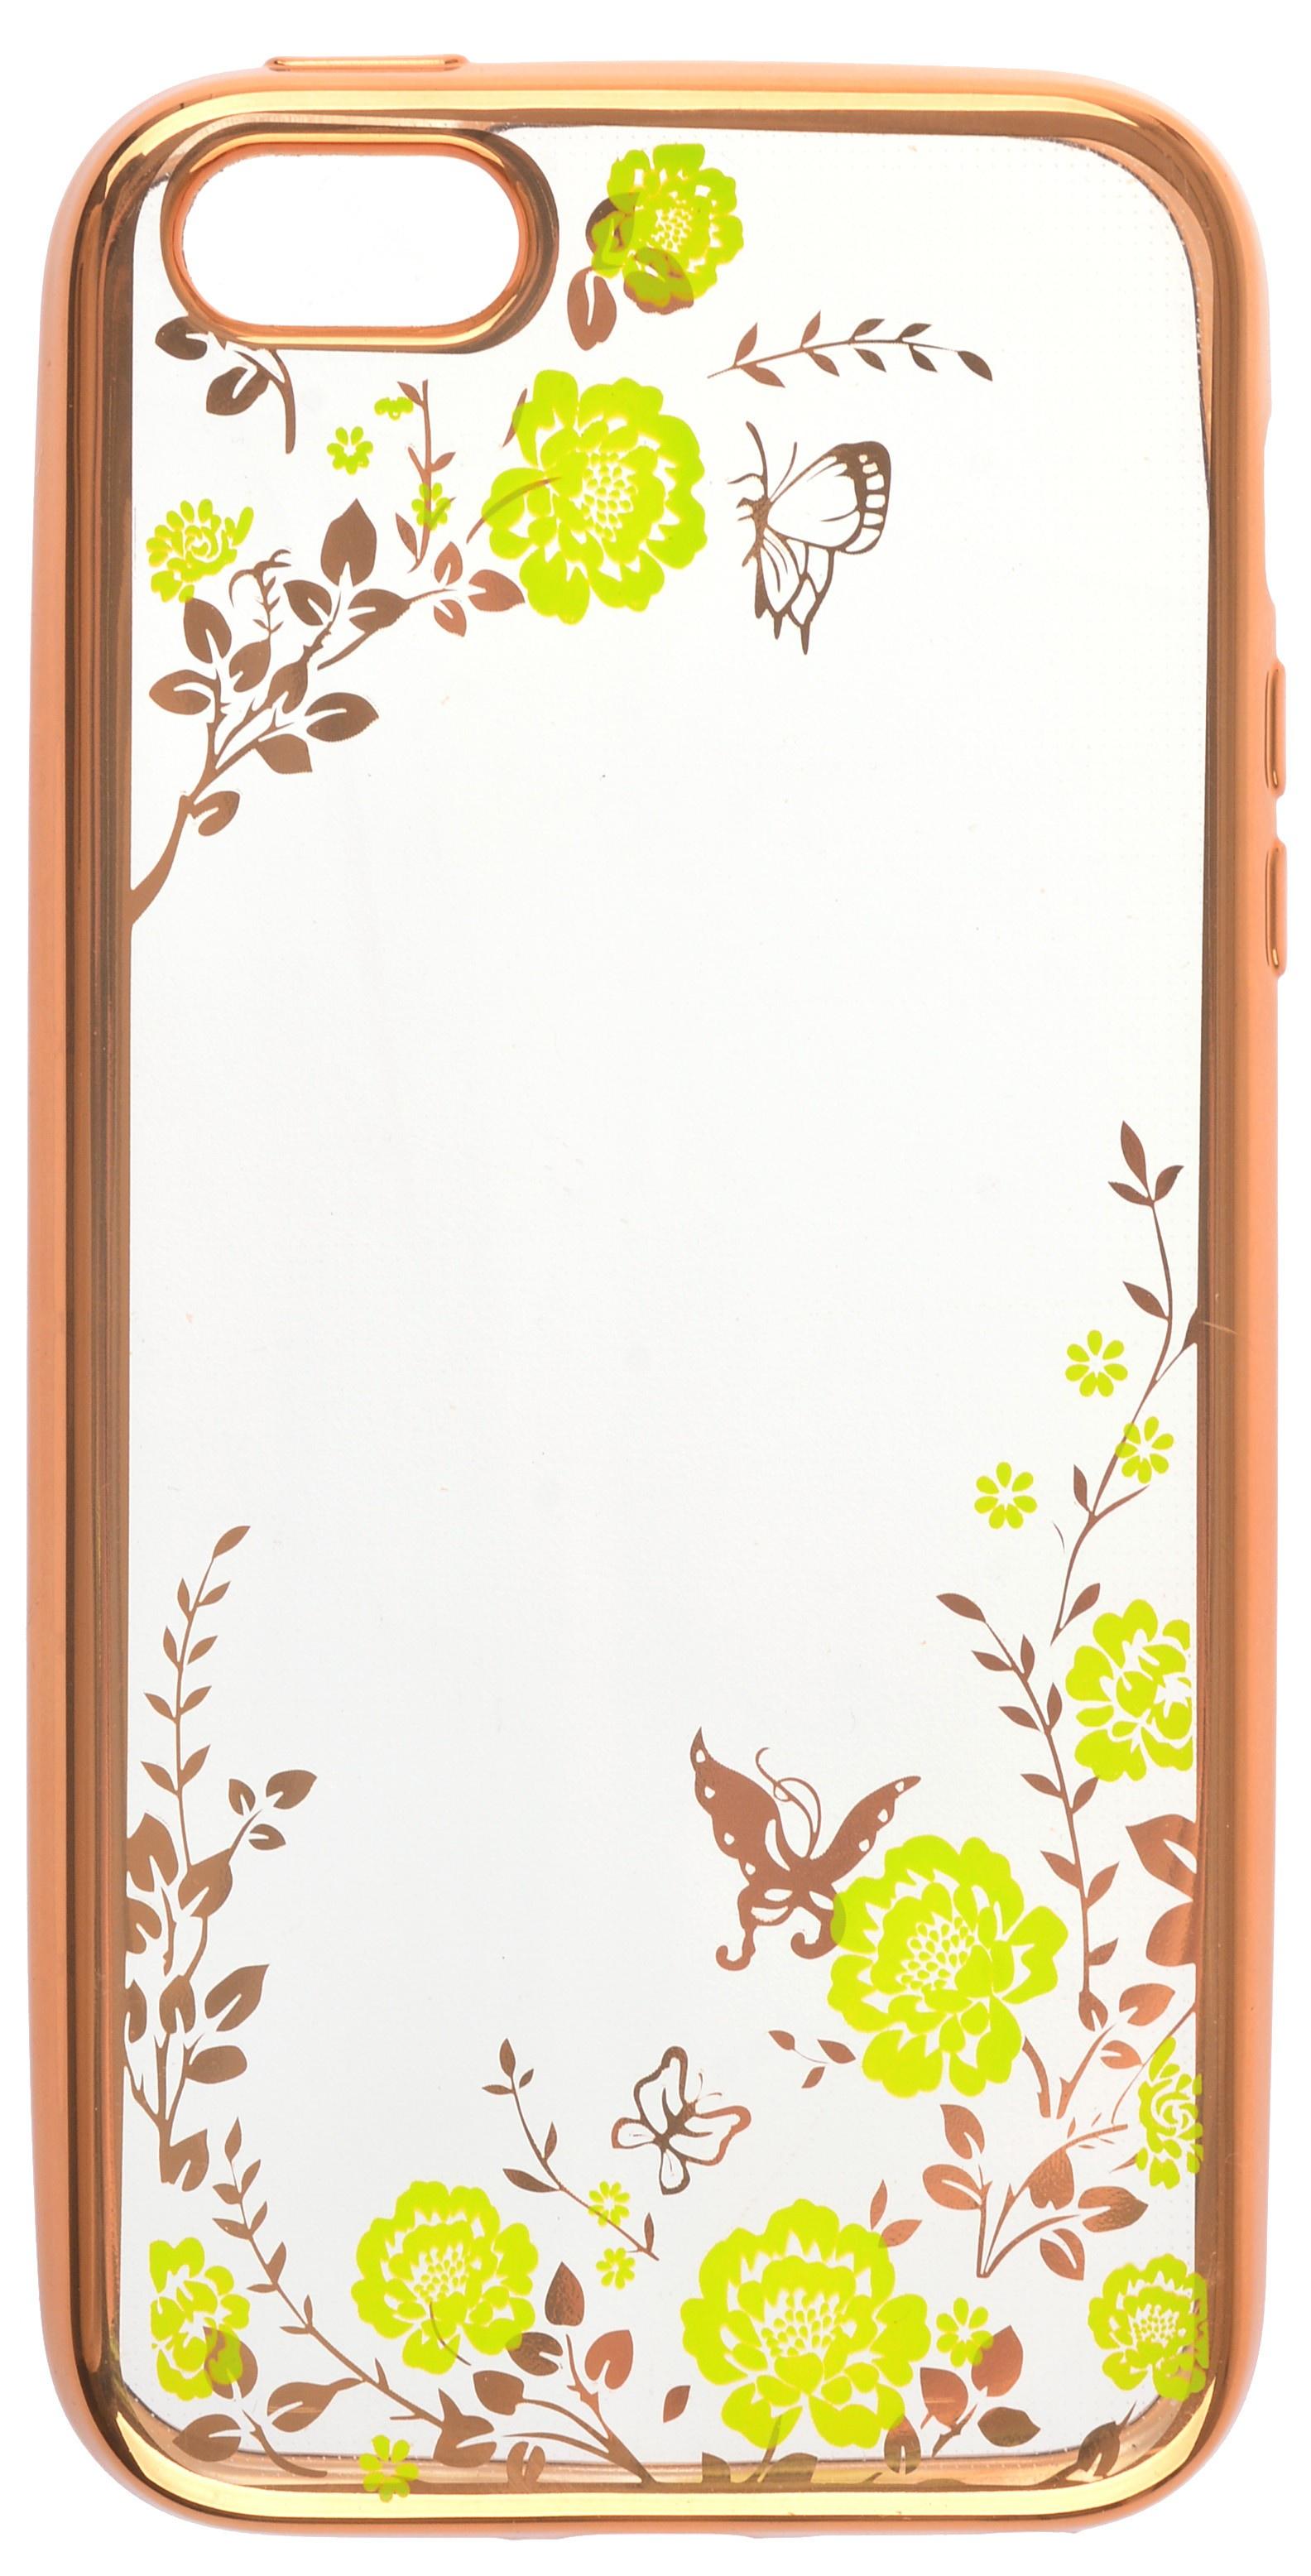 Накладка skinBOX для Apple Iphone 5/5S, 2000000111933, зеленый booratino деревянная накладка для iphone 5 5s орех